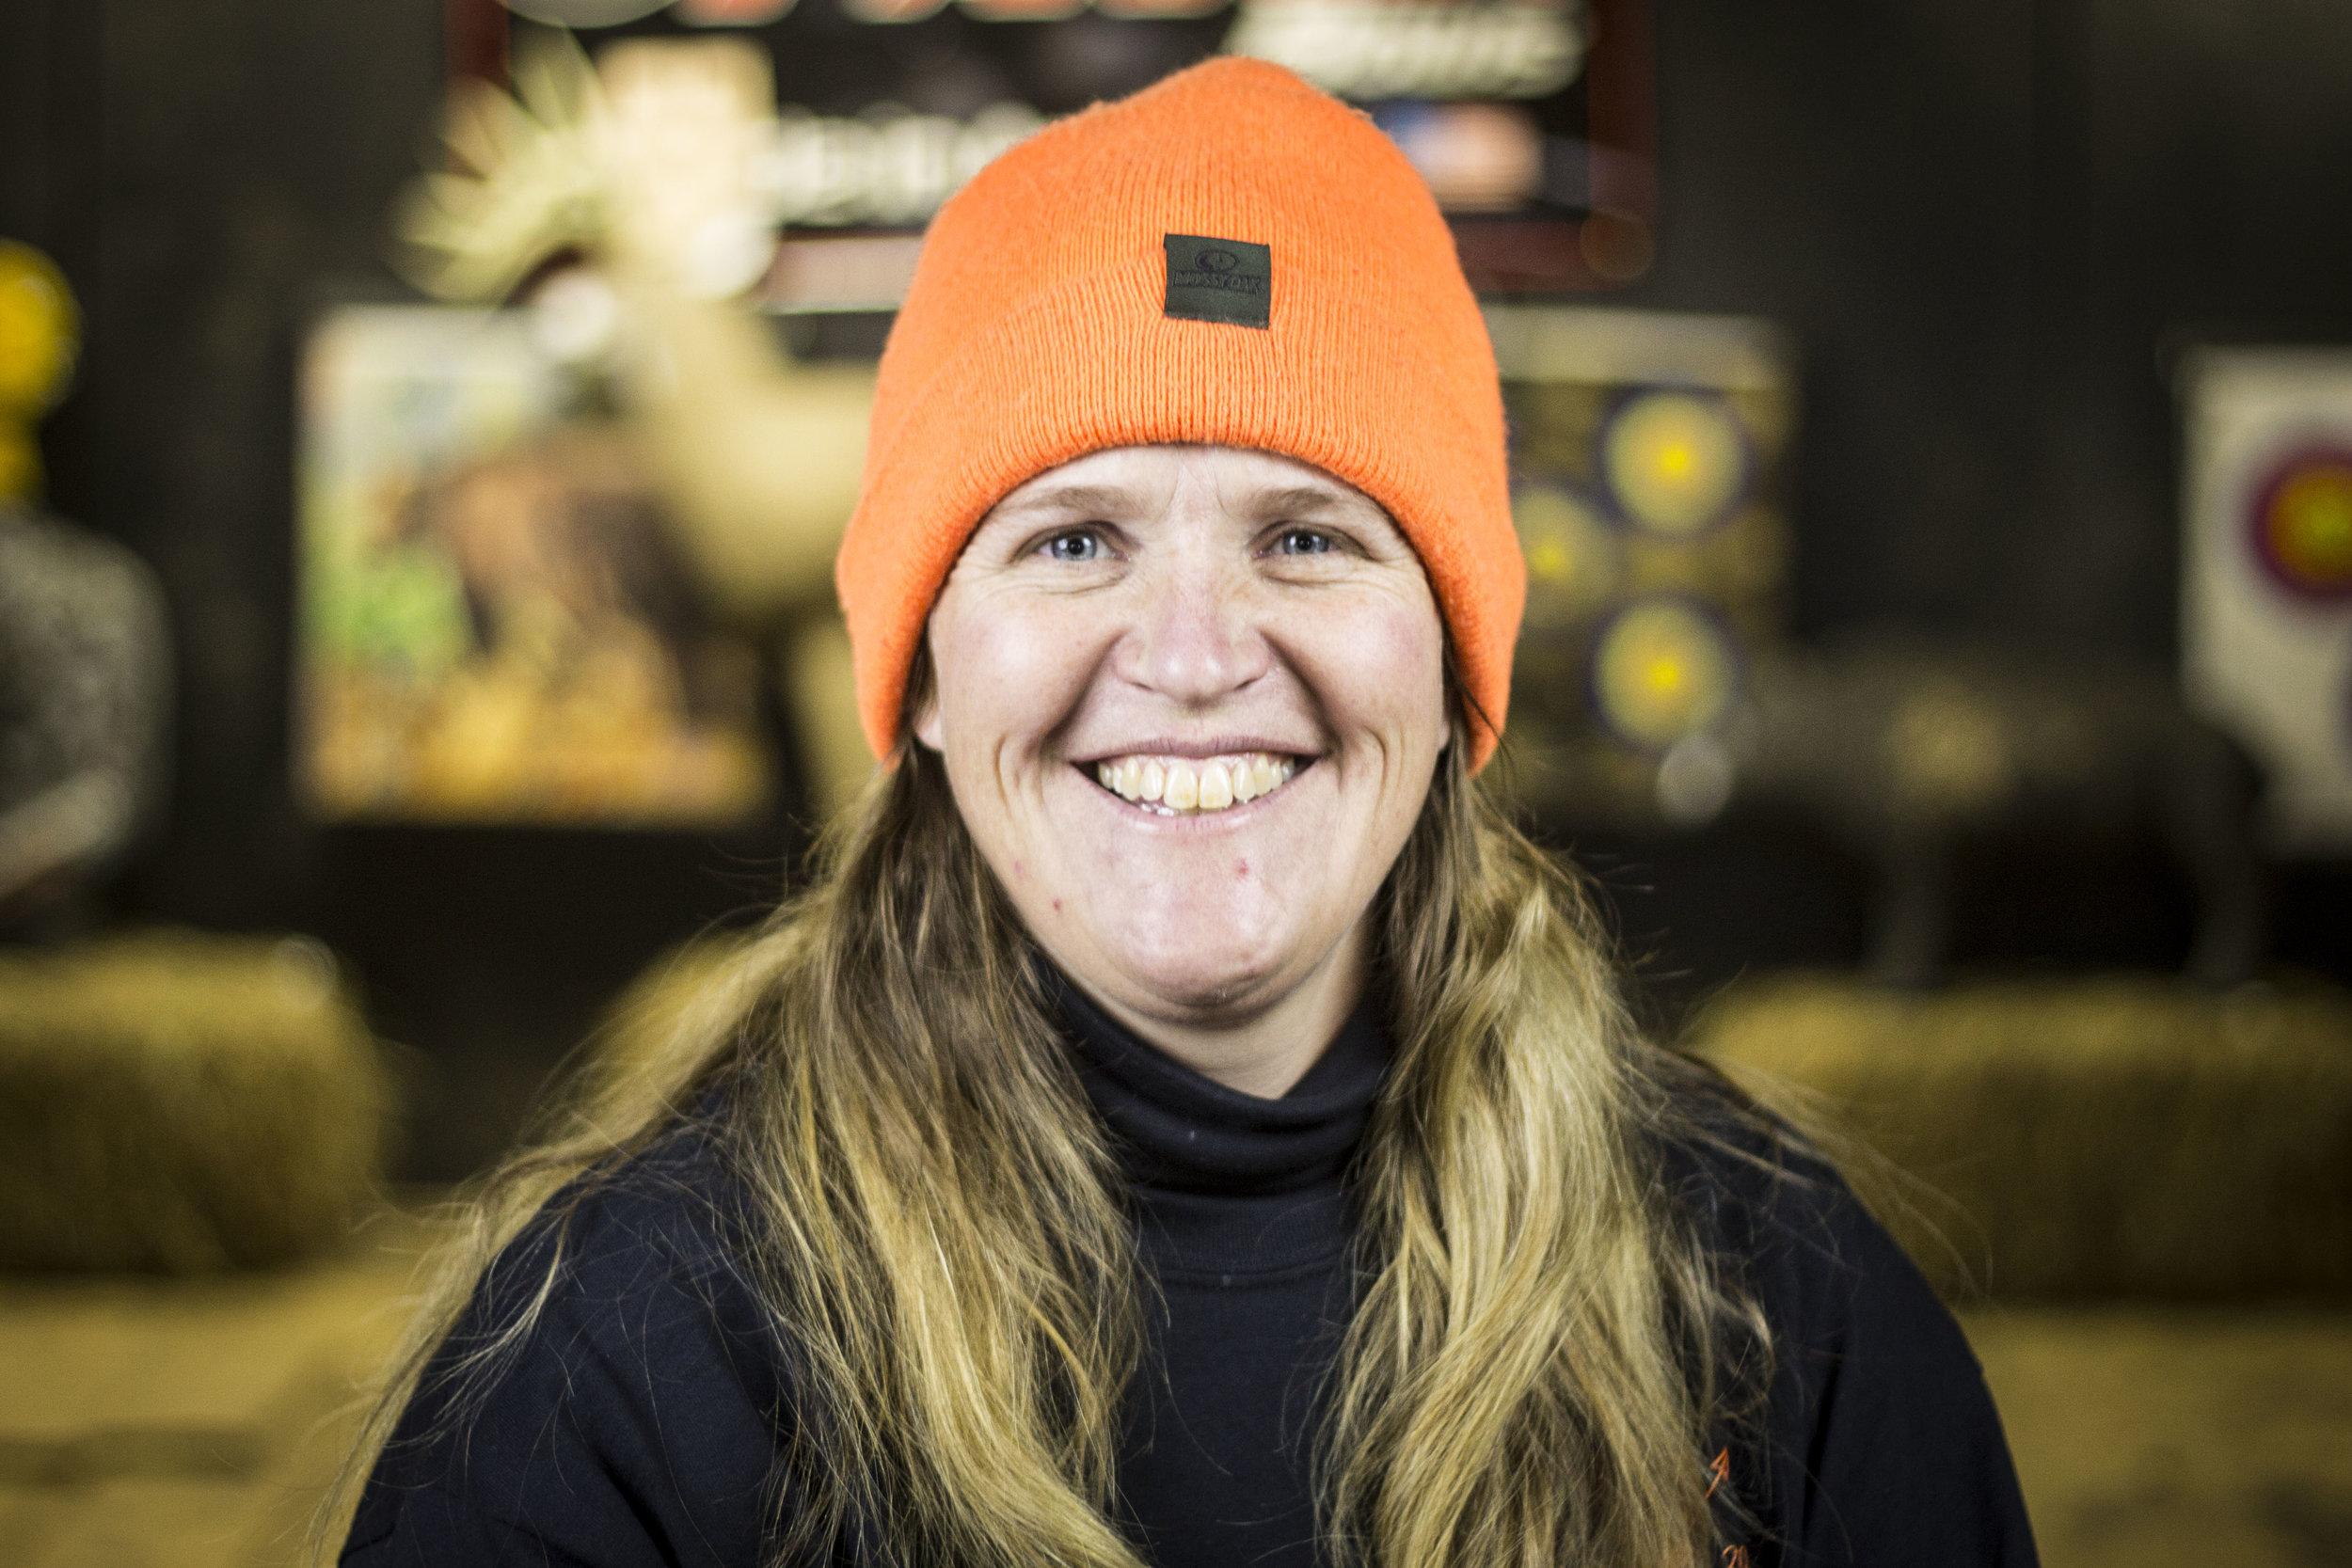 Tanya Towne - Owner/OperatorService TechnicianSales Associate